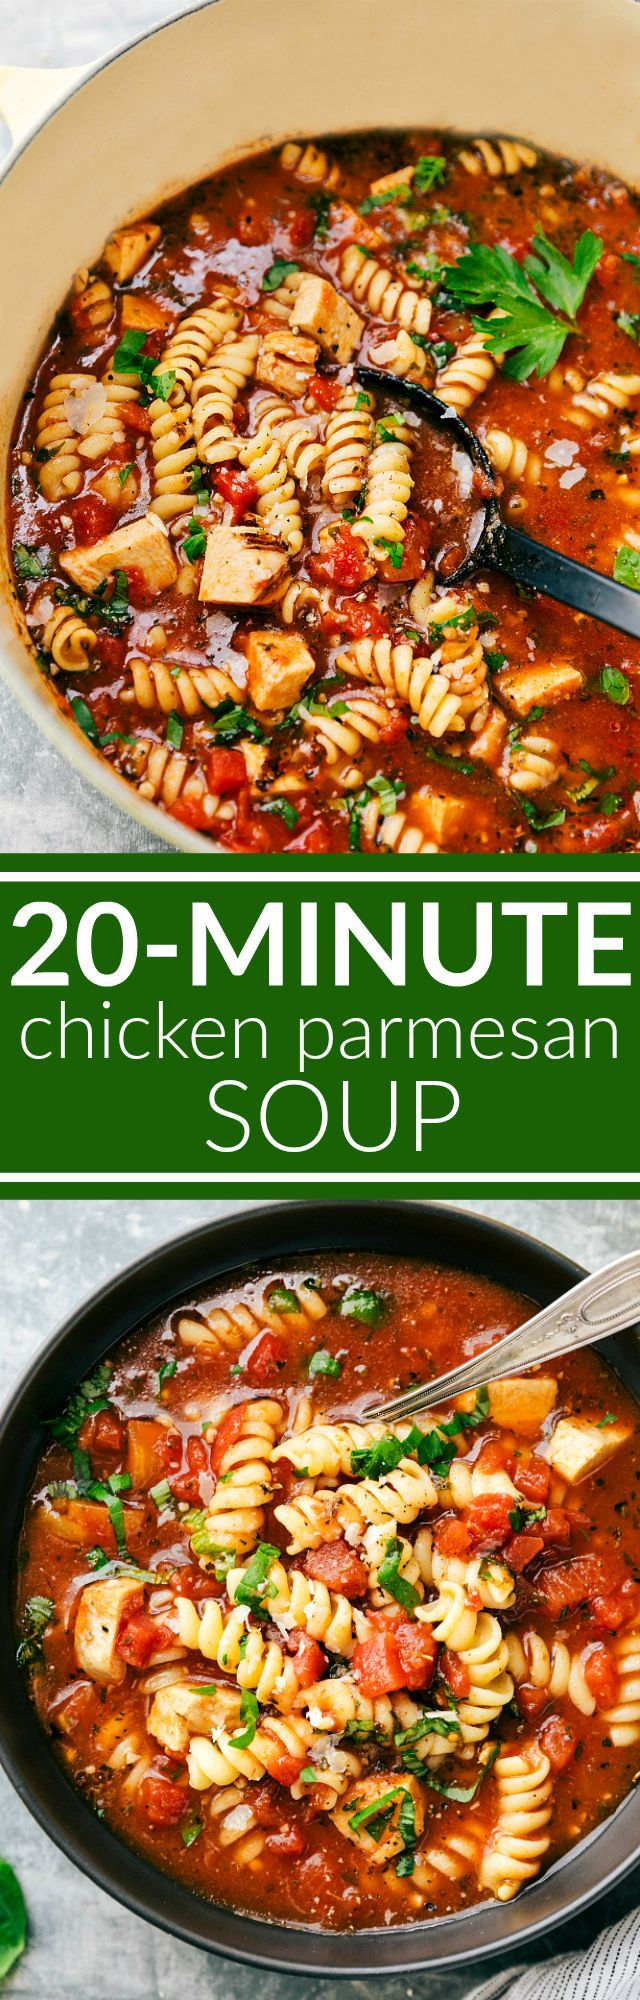 20-Minute Chicken Parmesan Soup   Chelsea's Messy Apron   Bloglovin'